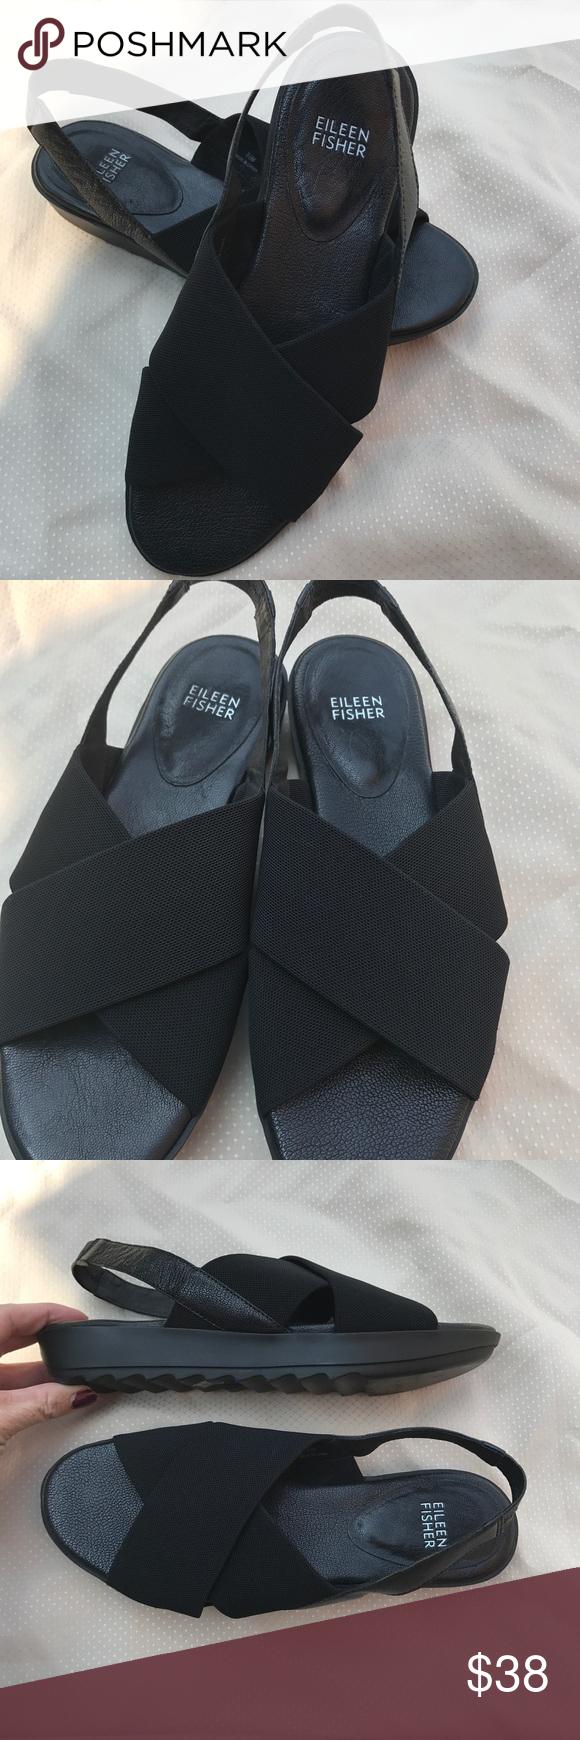 a7c42847cf2 Eileen Fisher 8.5 Trek Mesh Slingback sandal black Eileen Fisher size 8.5  black Trek Mesh Slingback